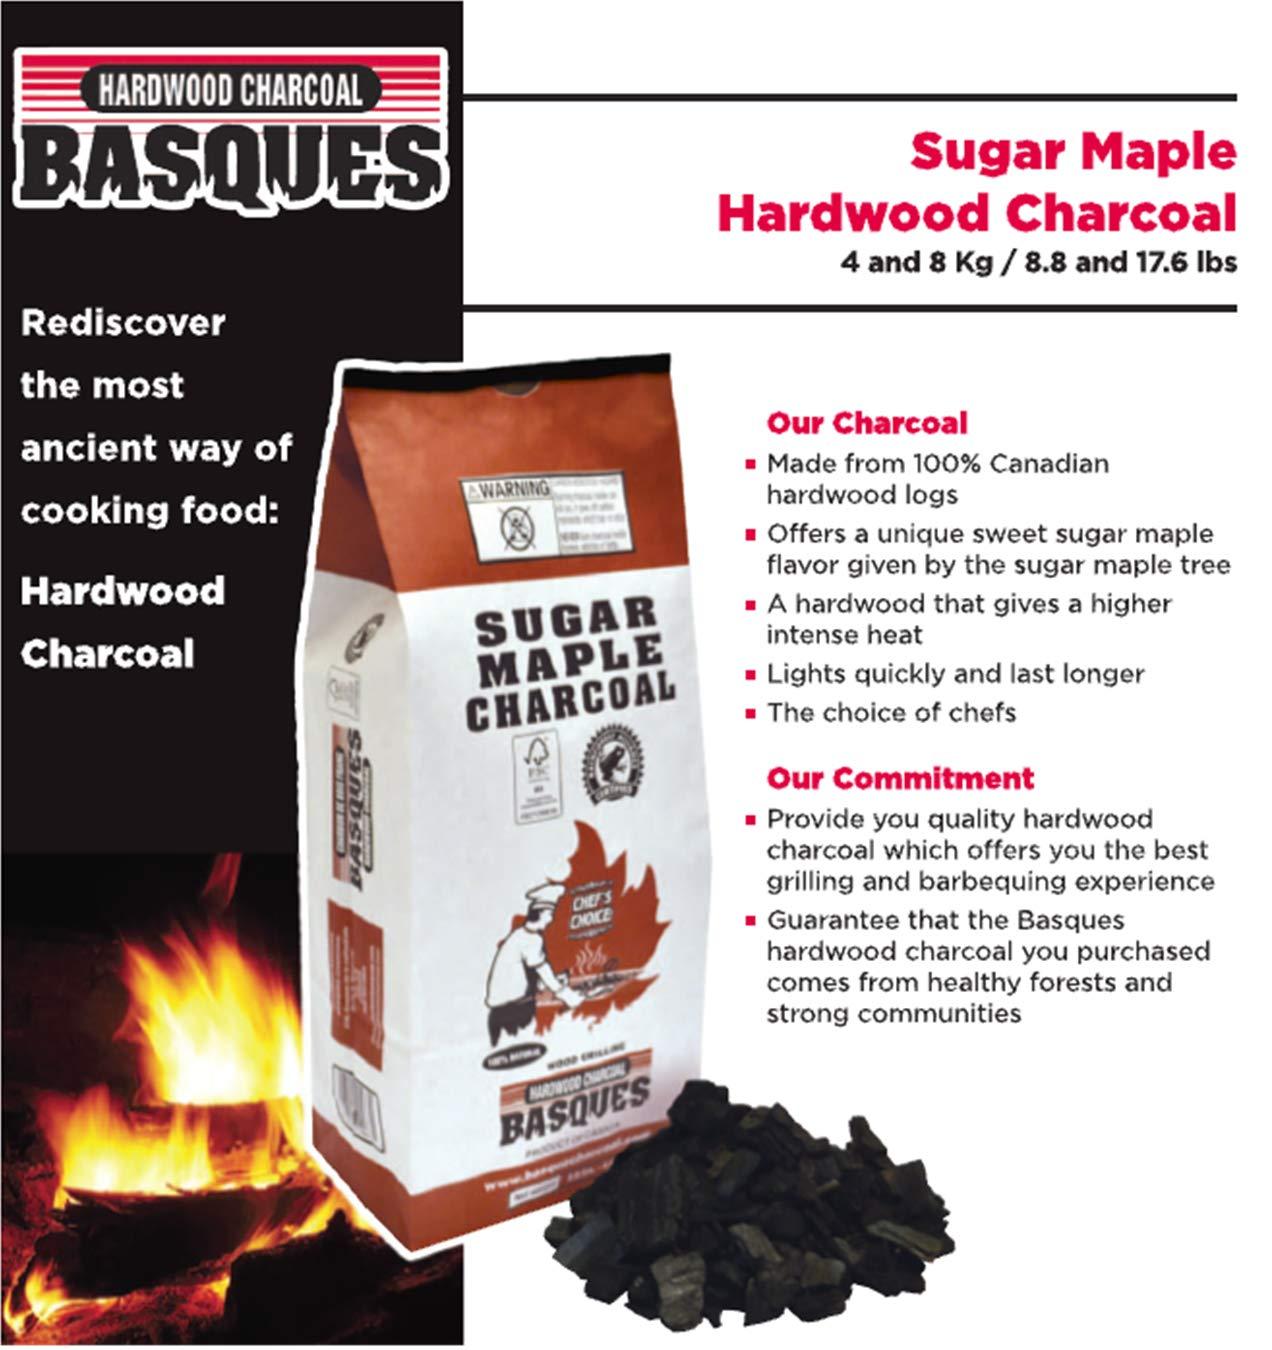 Basques Hardwood Chacoa 61553 Sugar Maple Lump Charcoal, 17.6 Lbs by Basques Hardwood Chacoal